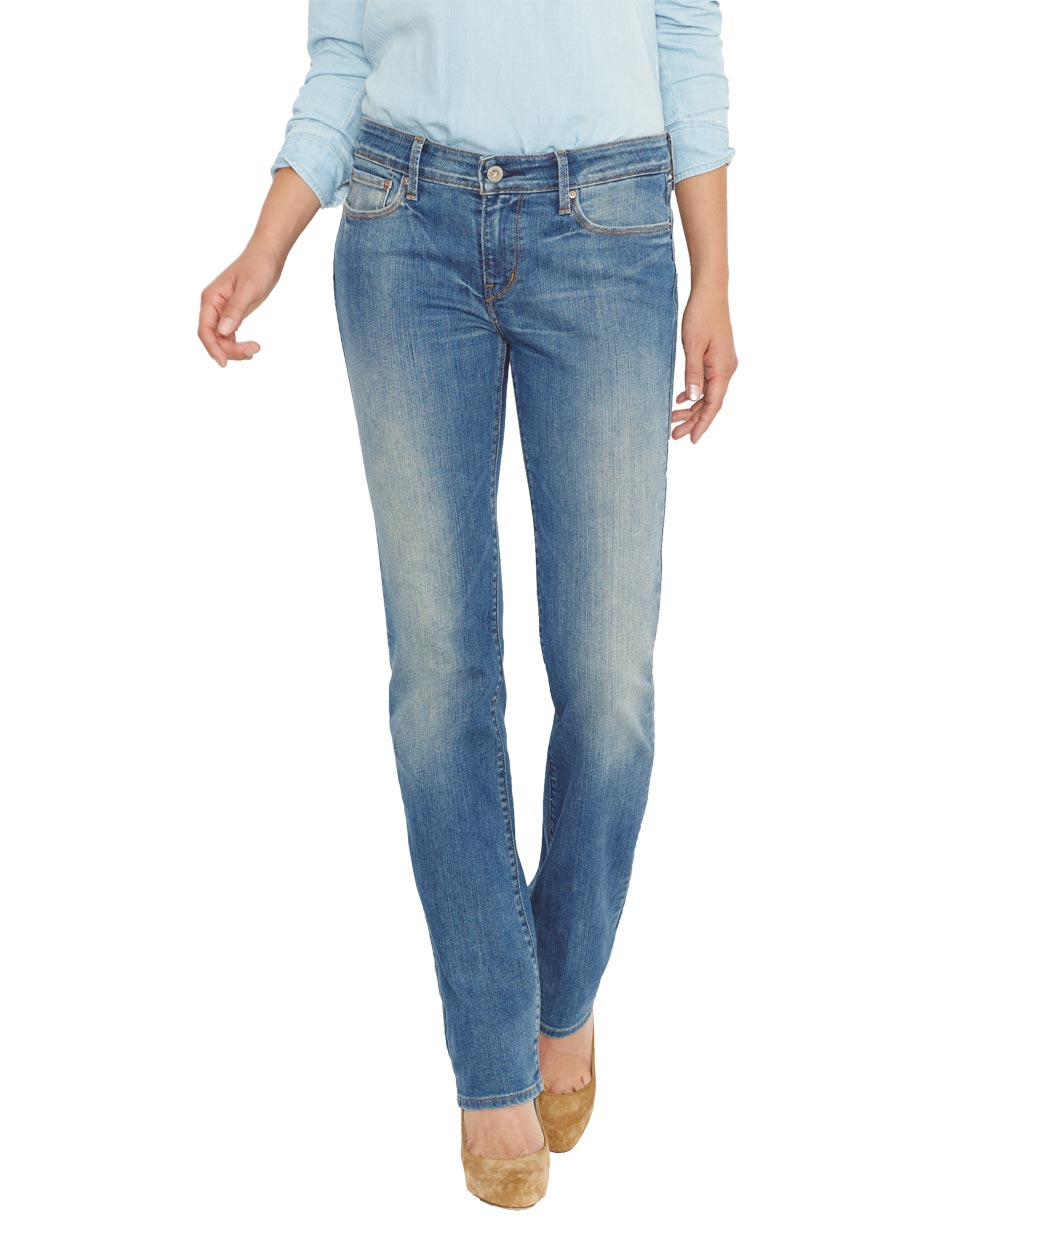 Levis Demi Curve - Straight Jeans - Sandwashed Shell